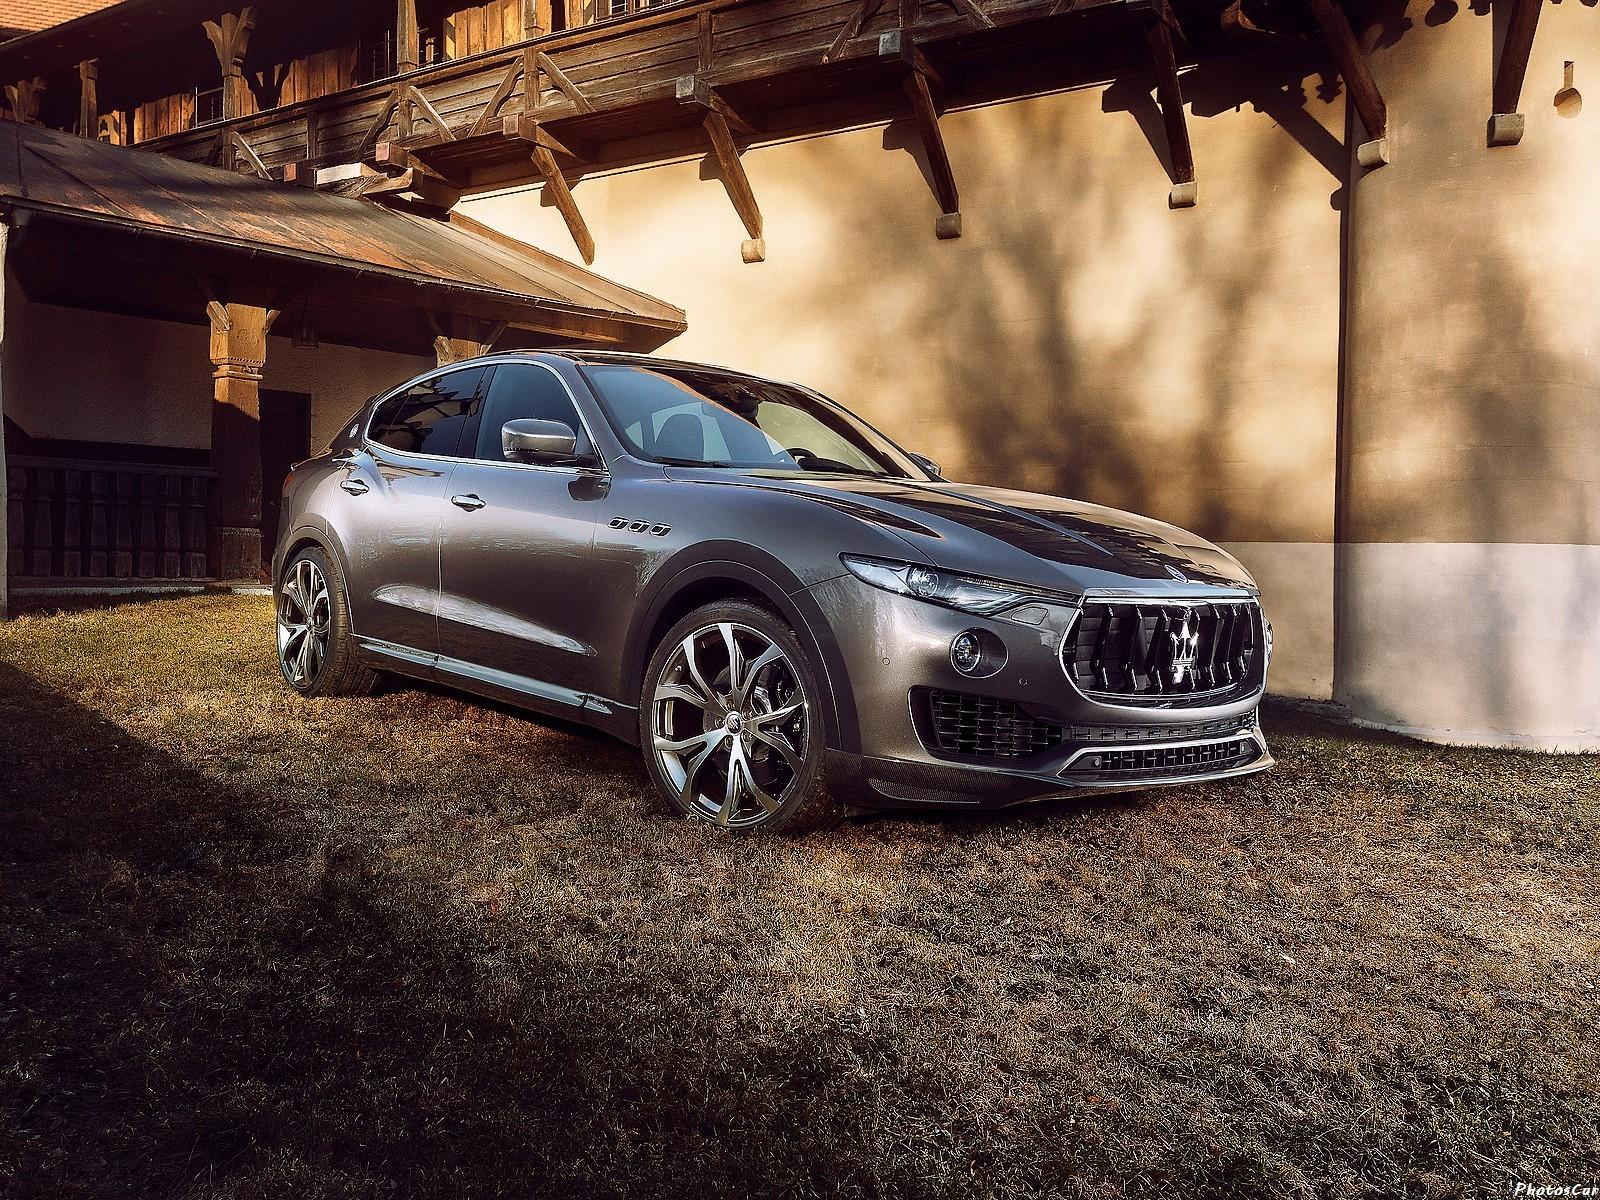 Novitec Tridente Maserati Levante 2017: La plus puissante délivre 430 ch